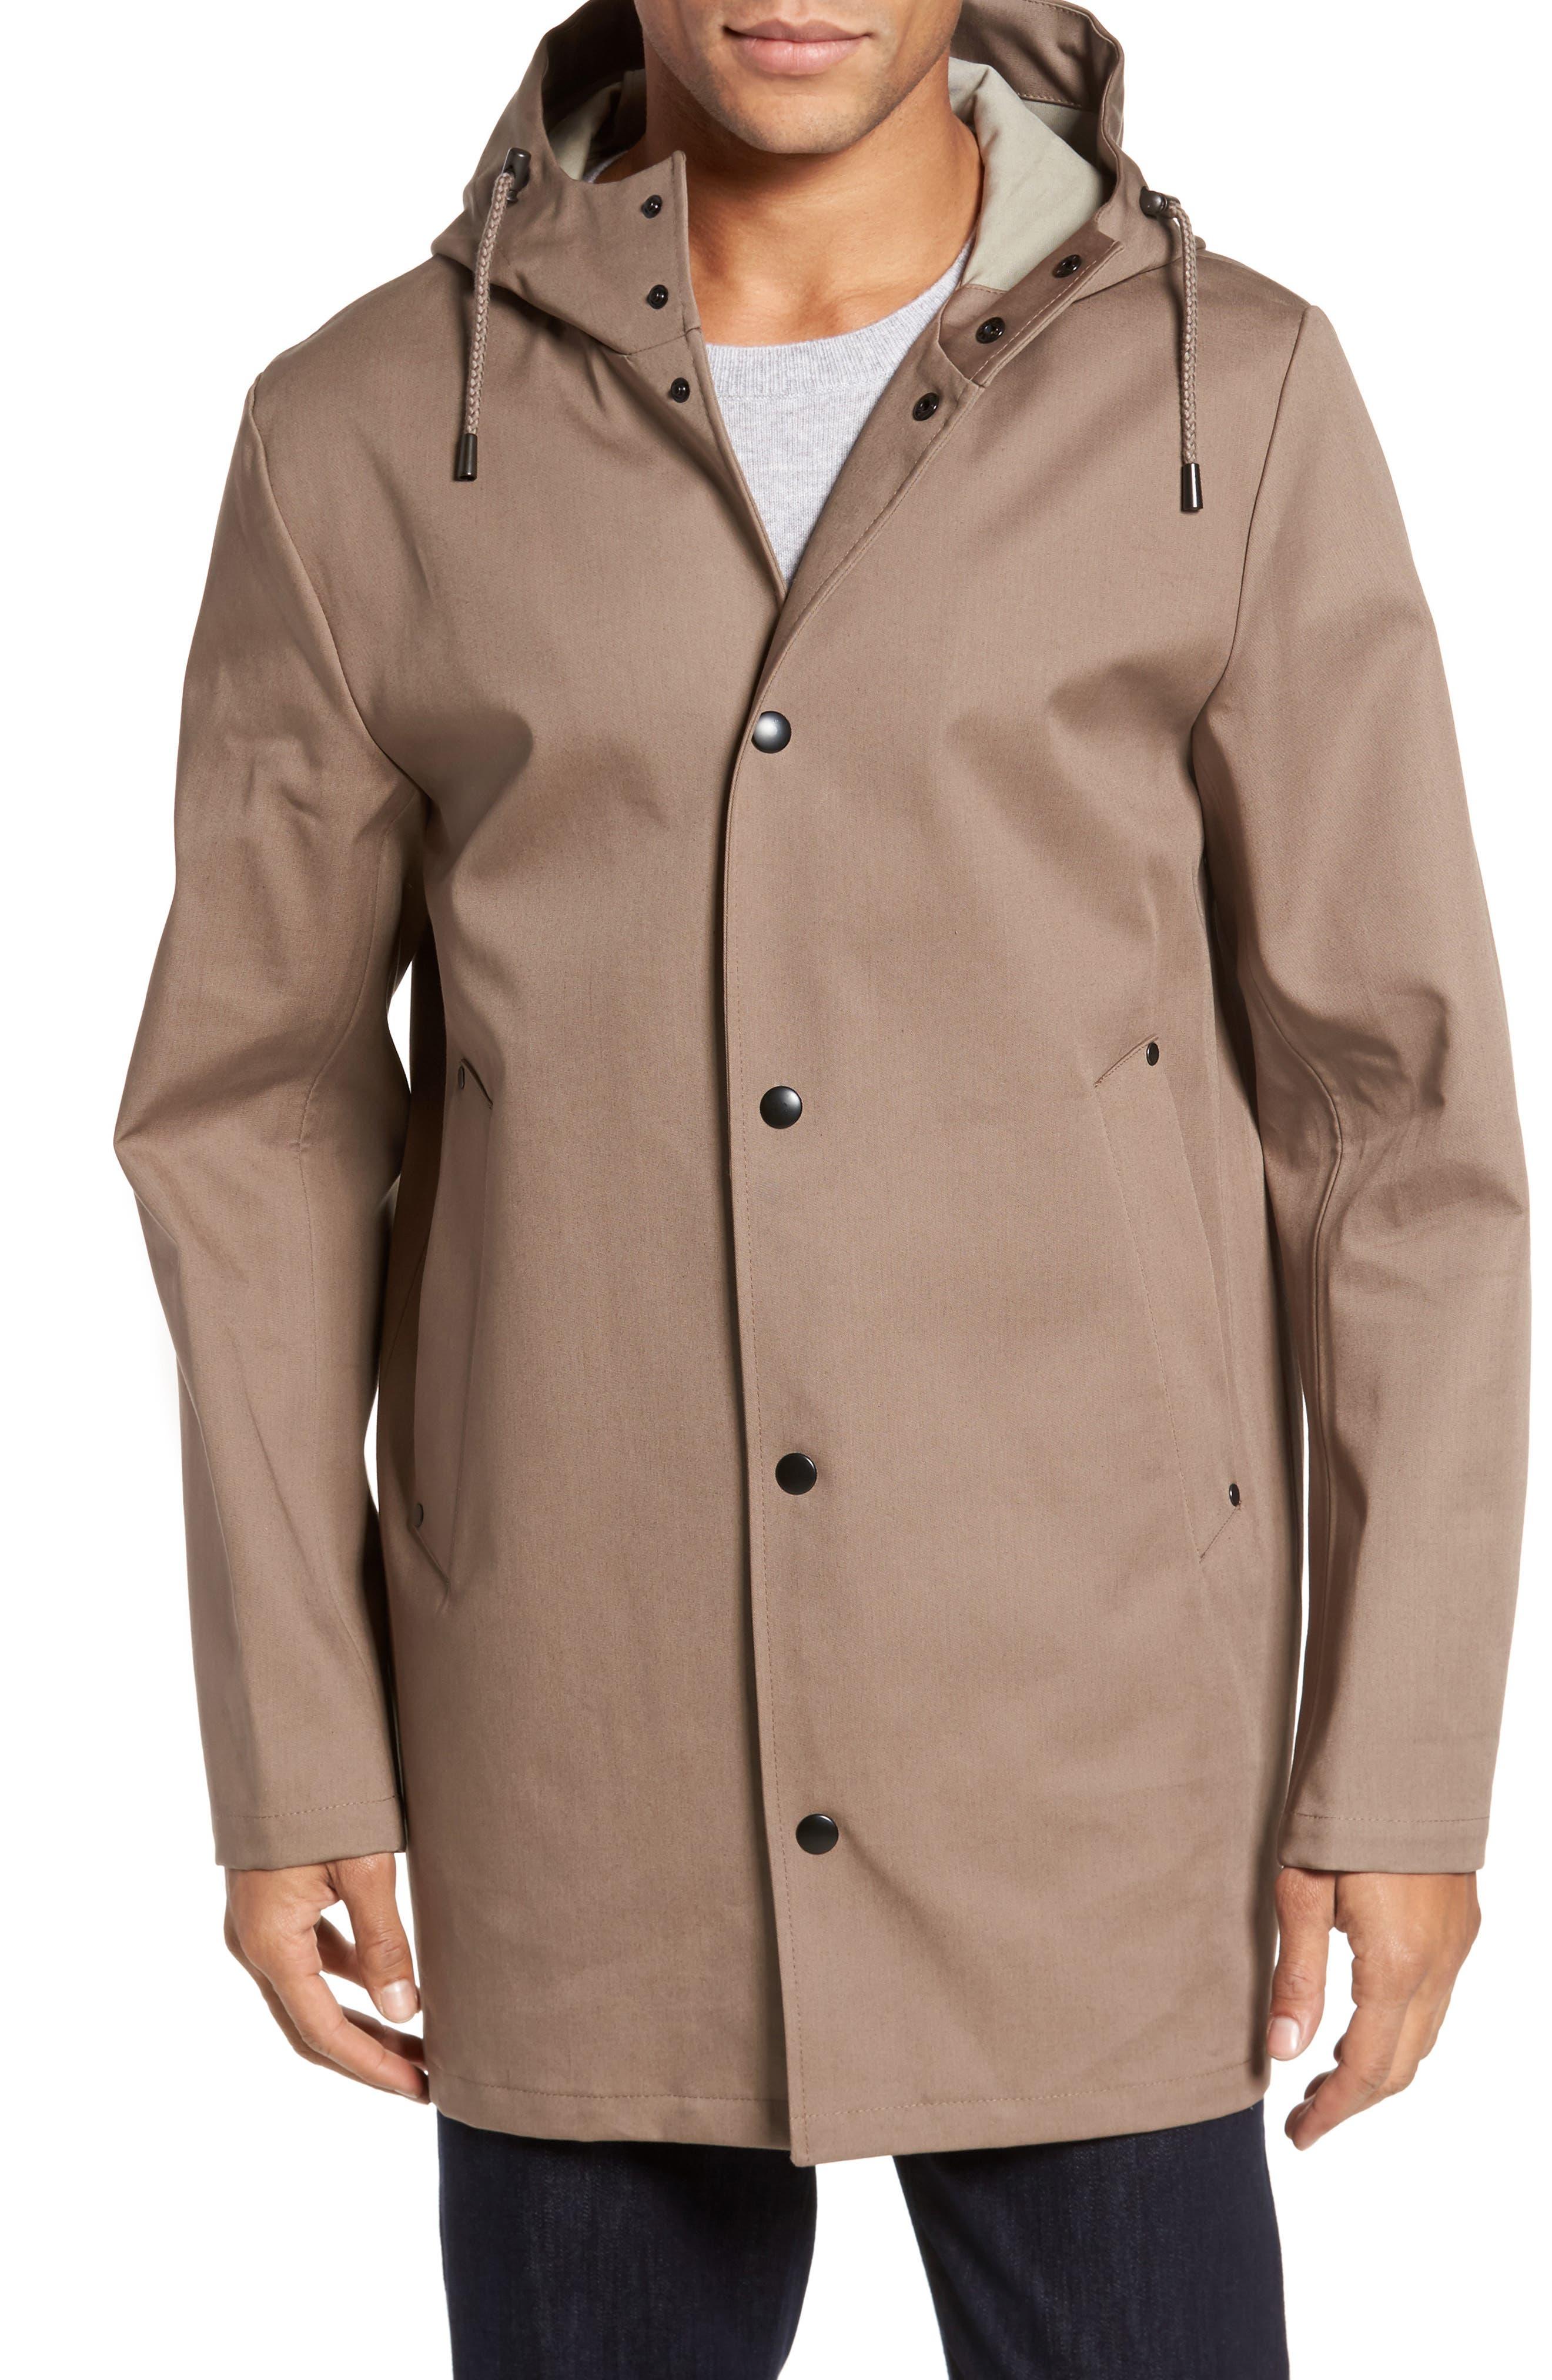 Stockholm Bonded Waterproof Hooded Raincoat,                             Alternate thumbnail 4, color,                             Mole